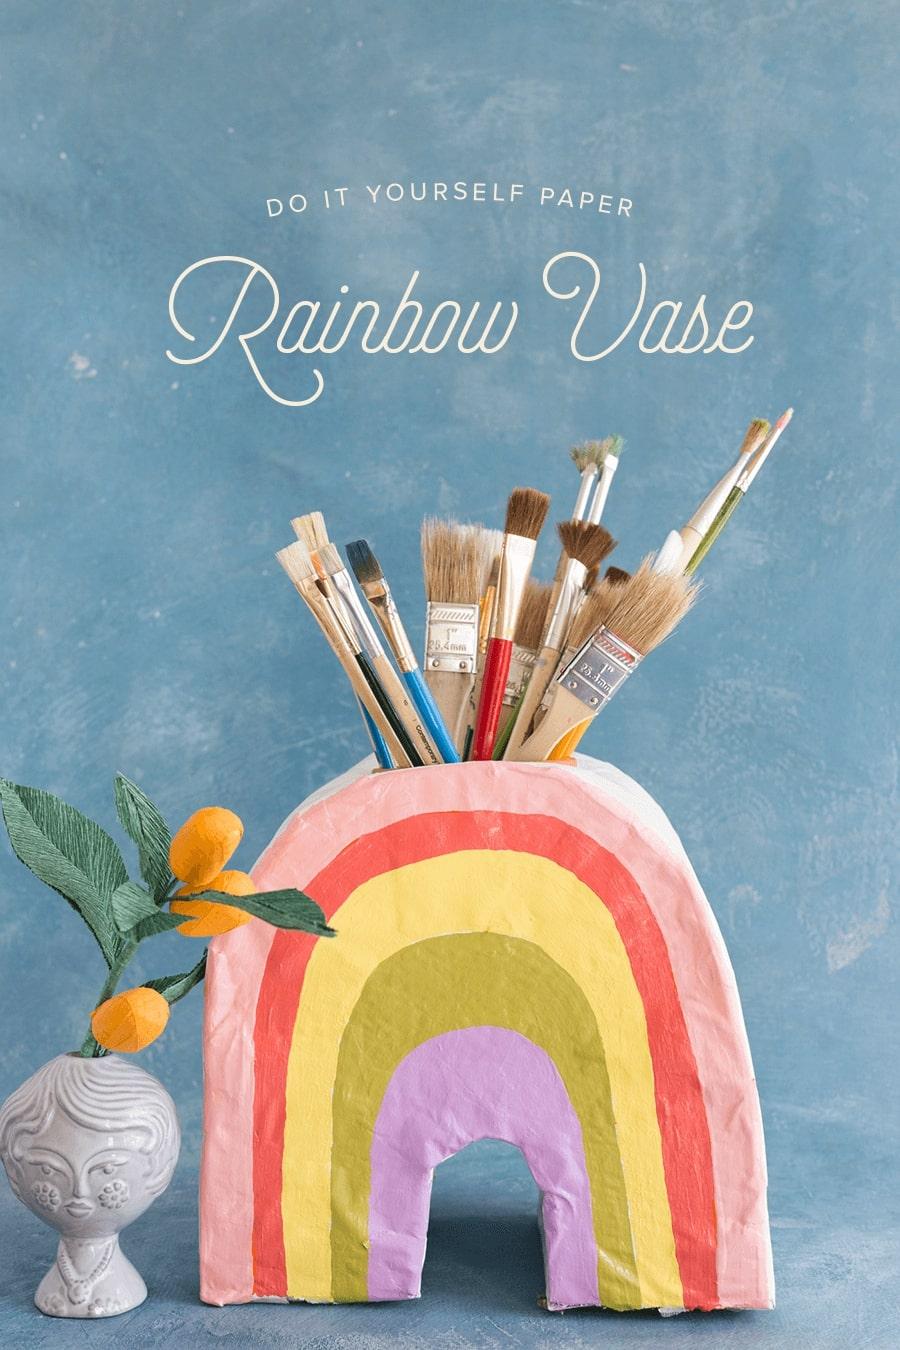 RAINBOW-VASE DIY